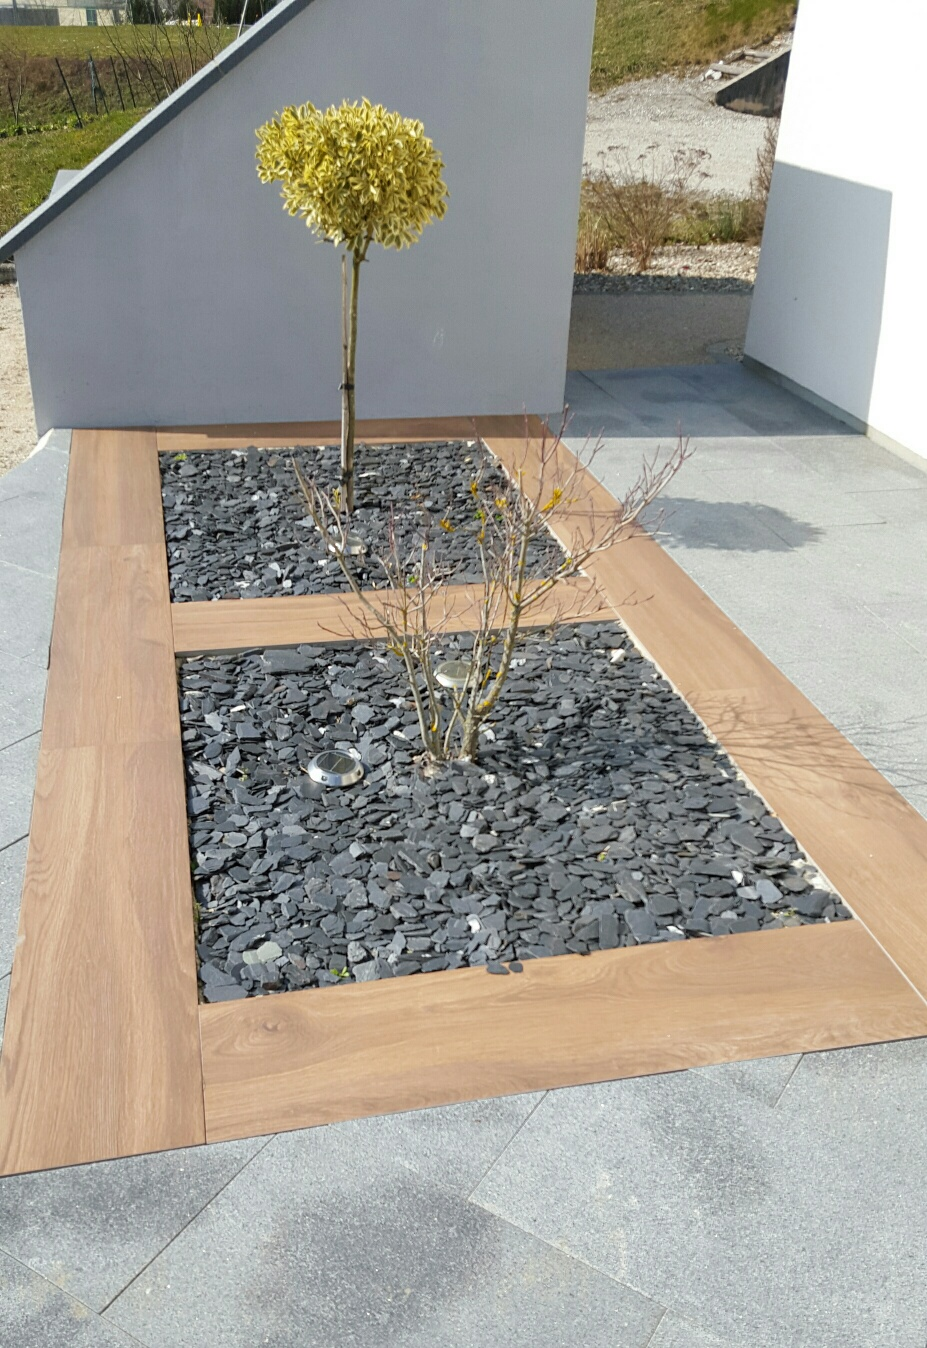 jardin minral ralis en dalles grs cram type mirage evo cm imitation bois with dalle mirage evo 2. Black Bedroom Furniture Sets. Home Design Ideas